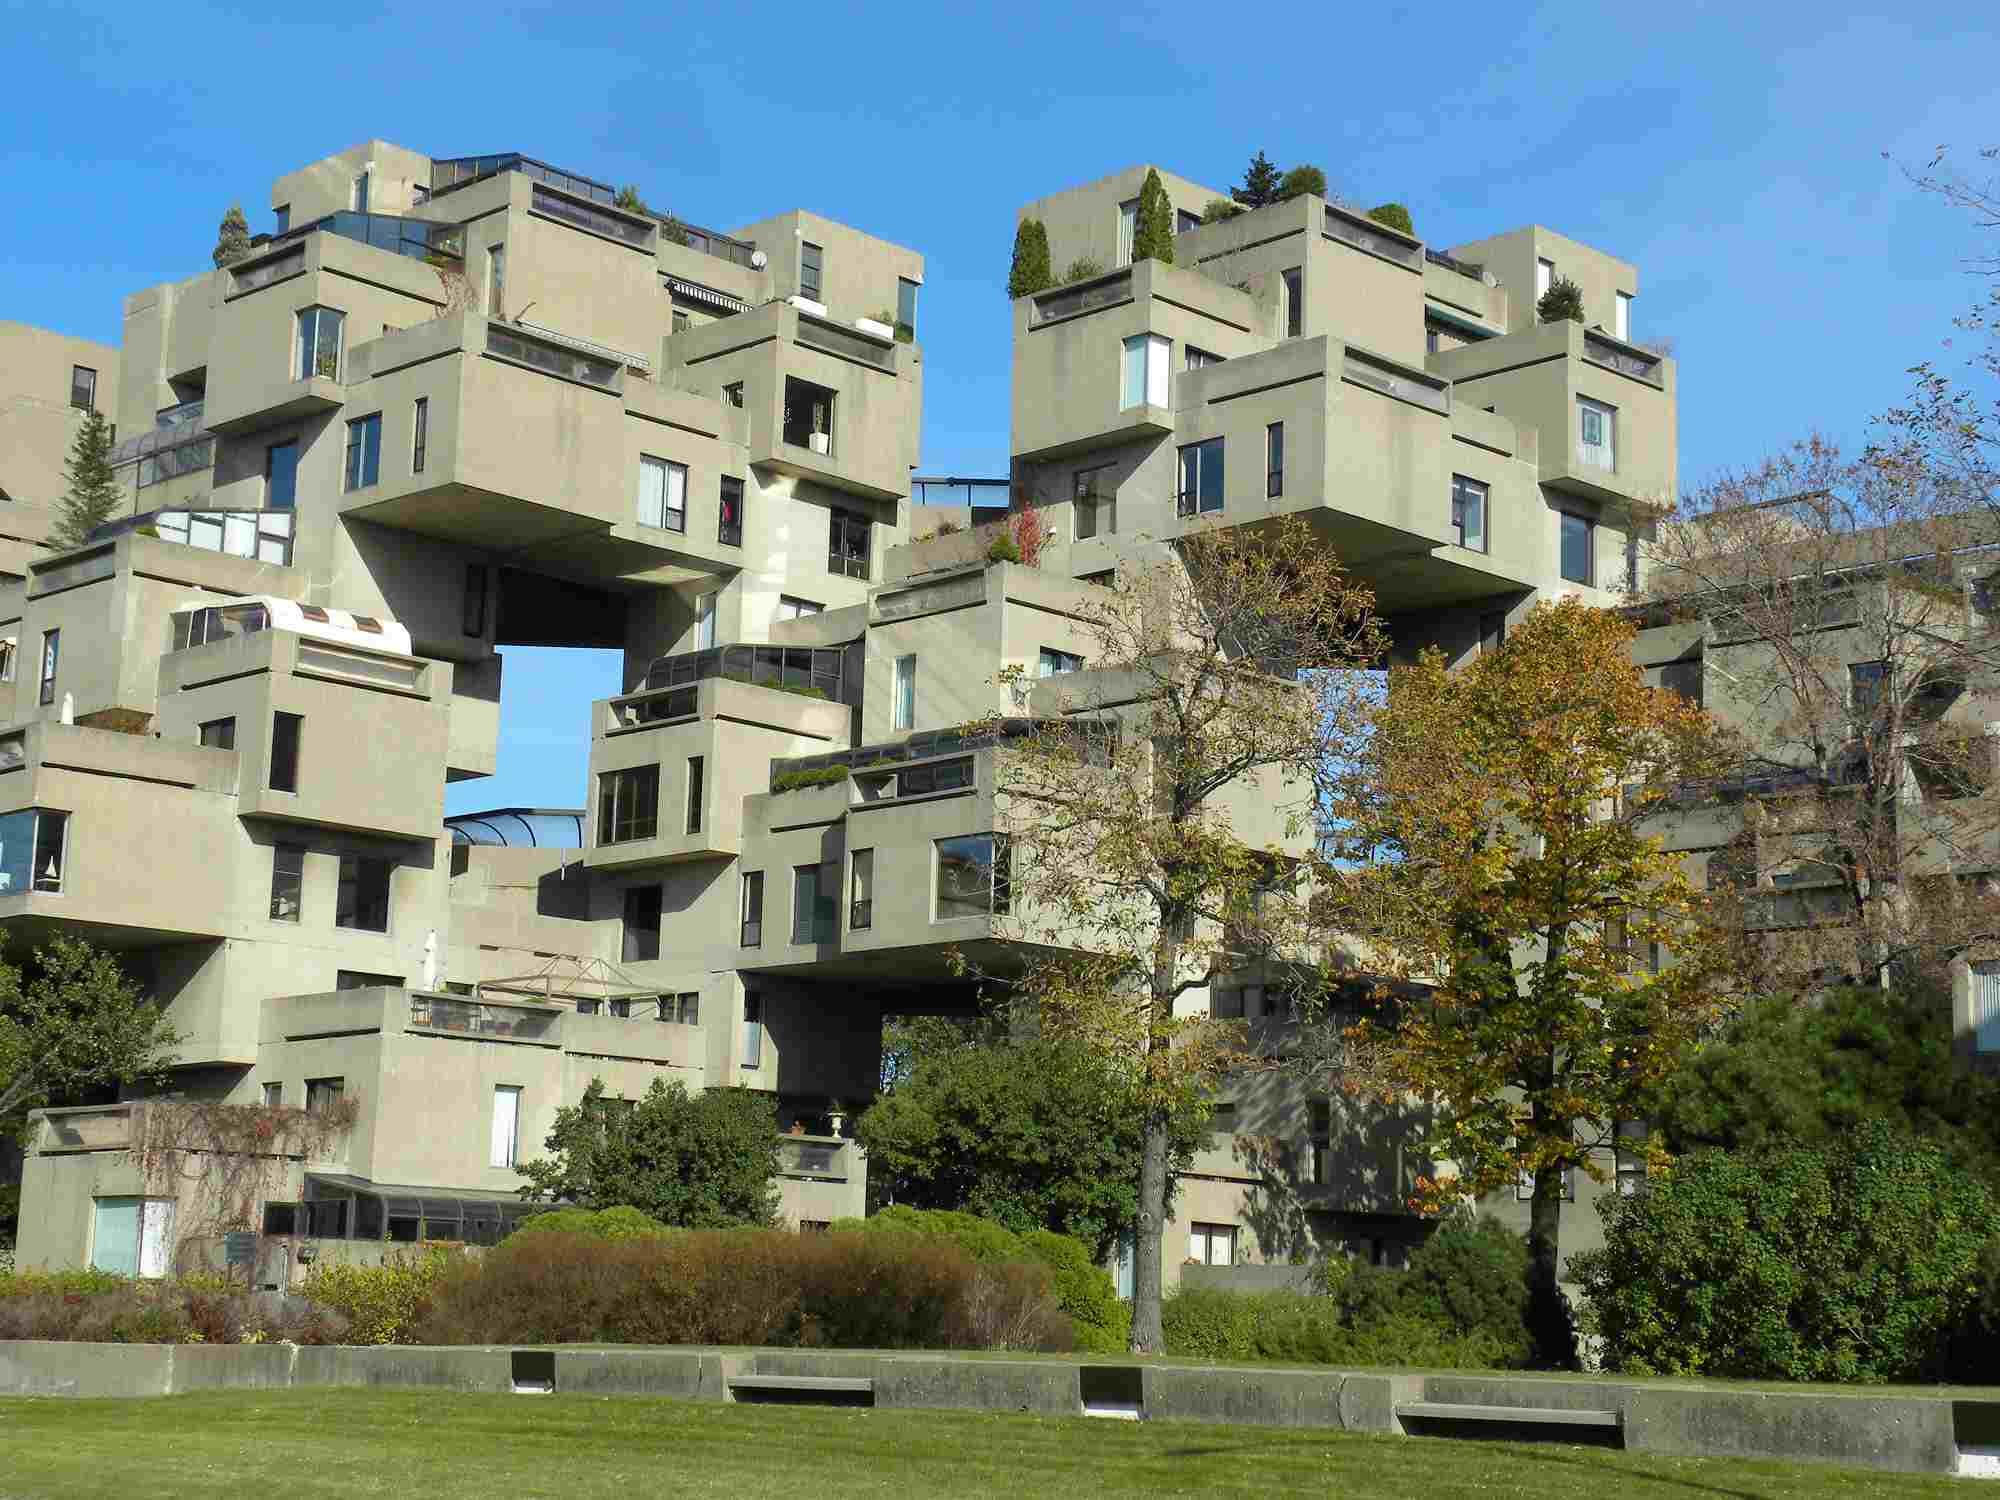 Photo of box-like apartment units, individually and randomly stacked.